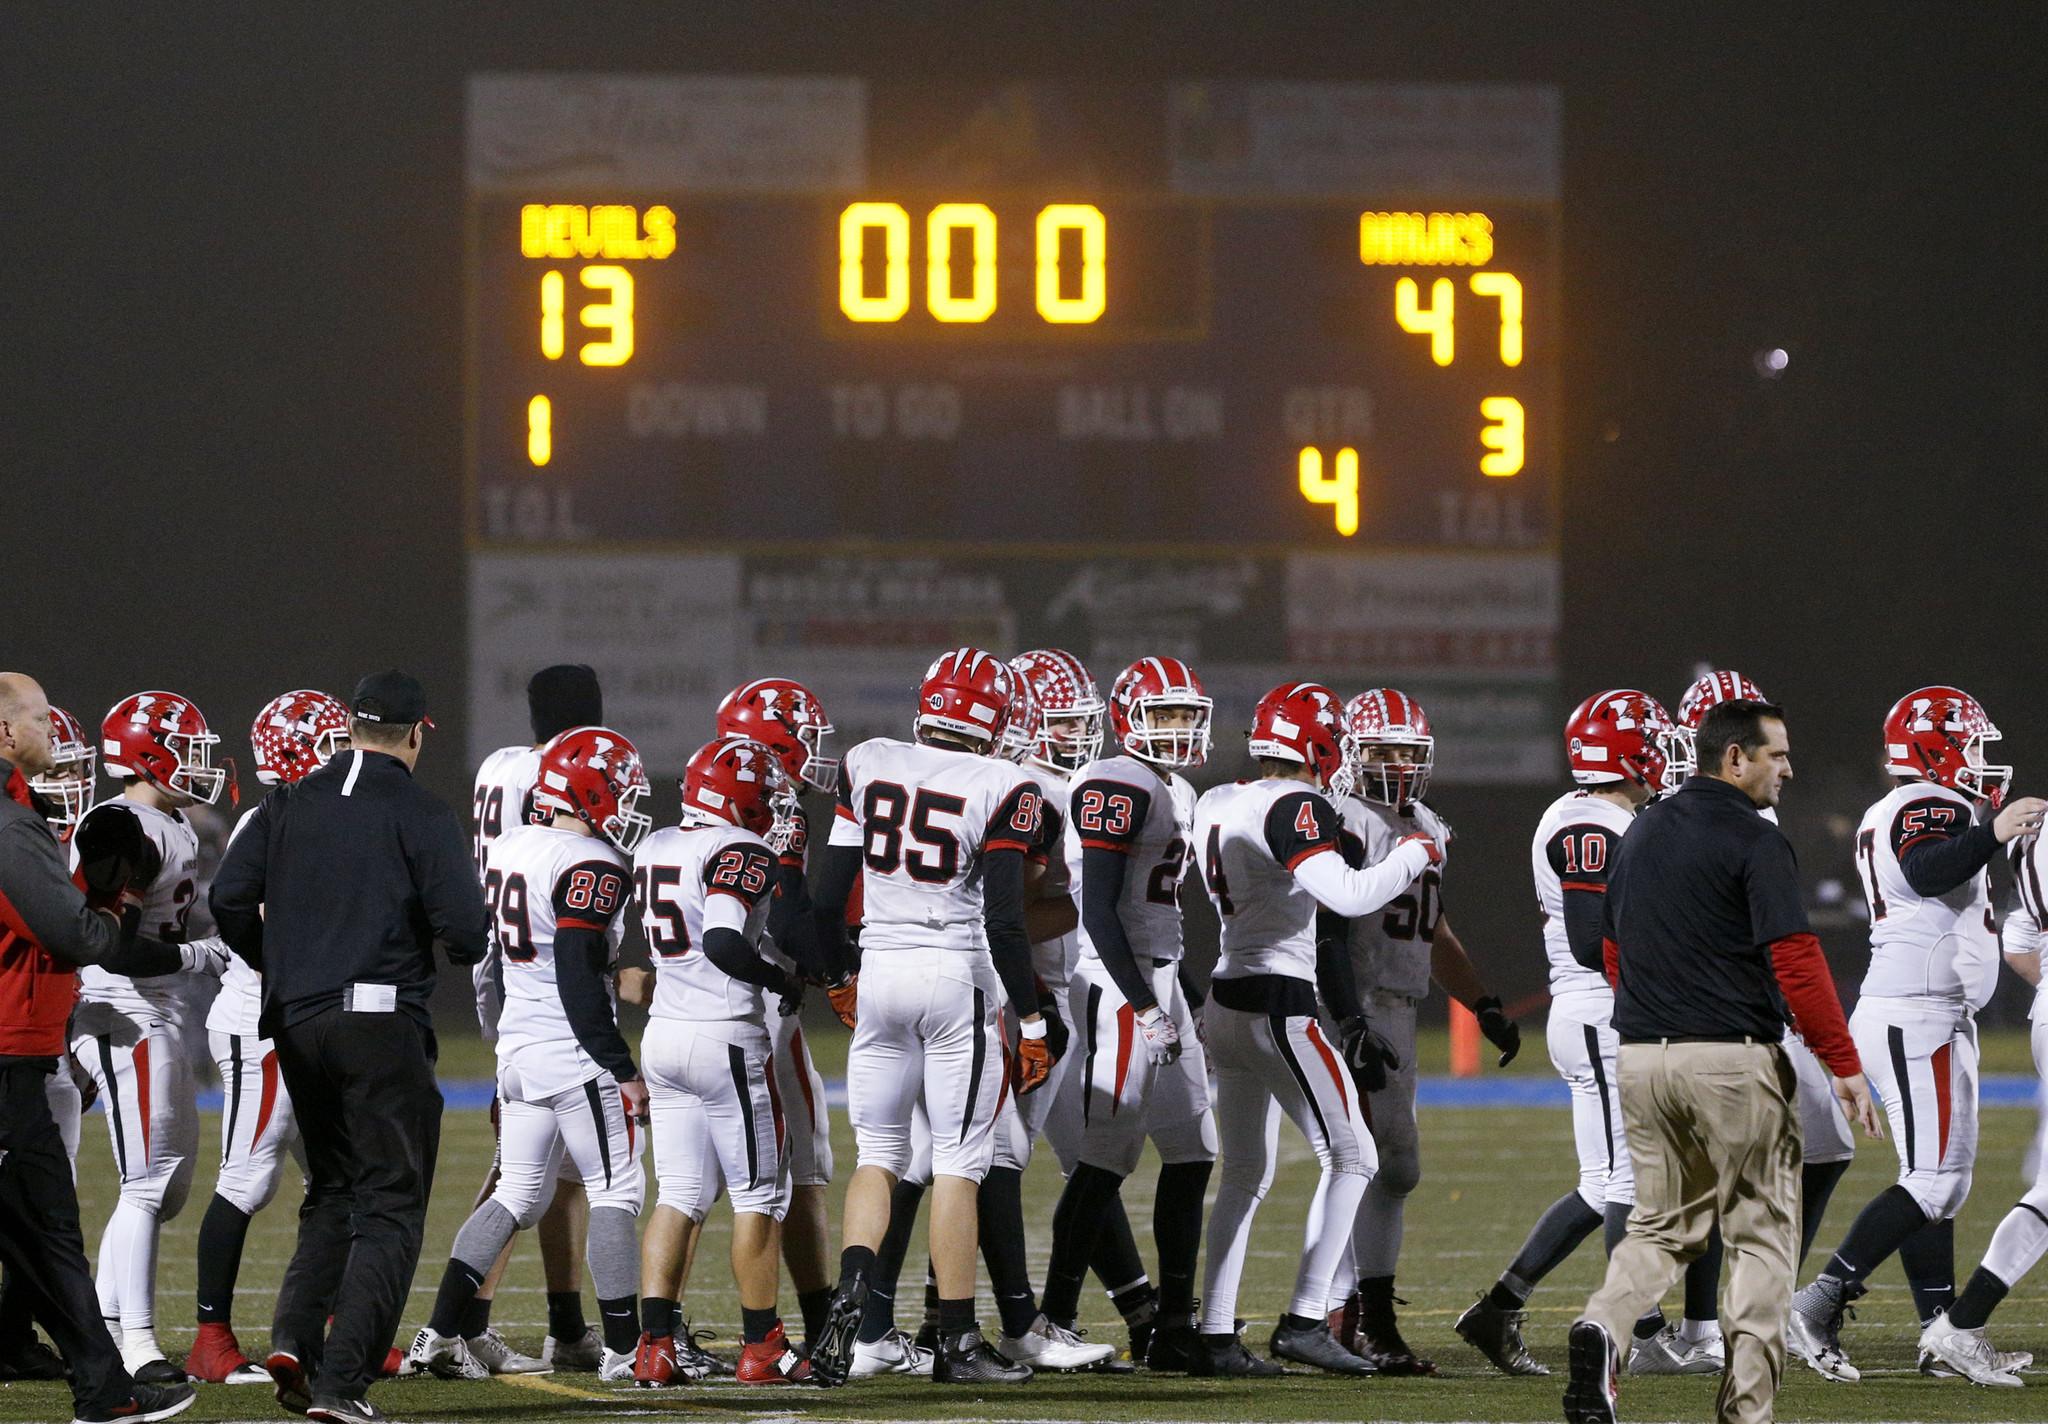 Chicago Area High School Football Week 12 Rankings